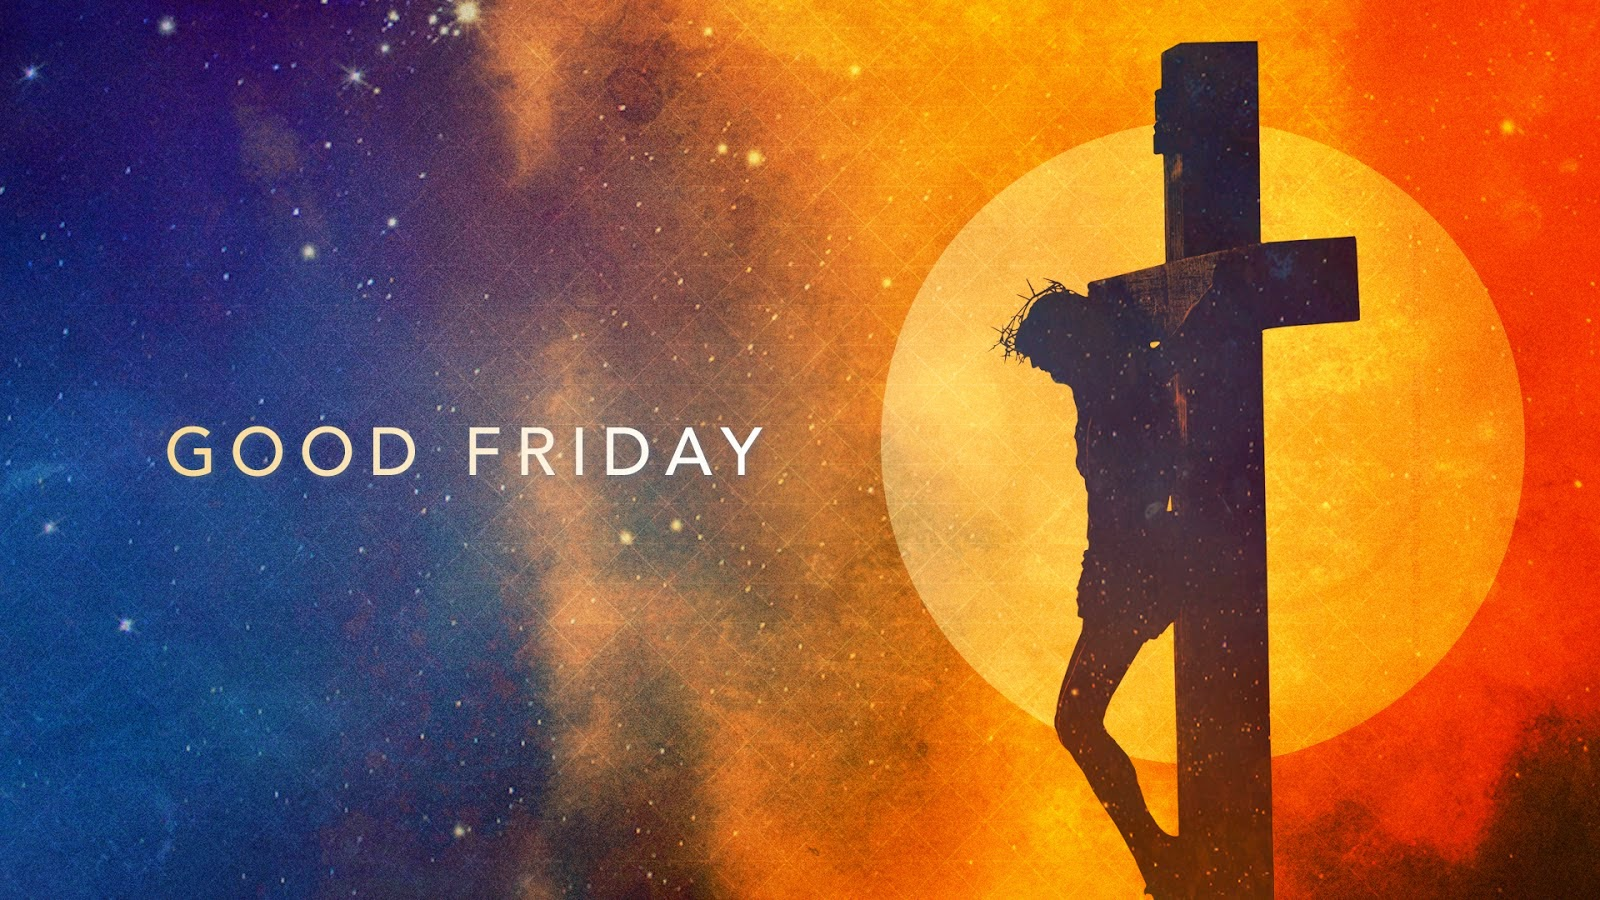 Good-Friday-Image